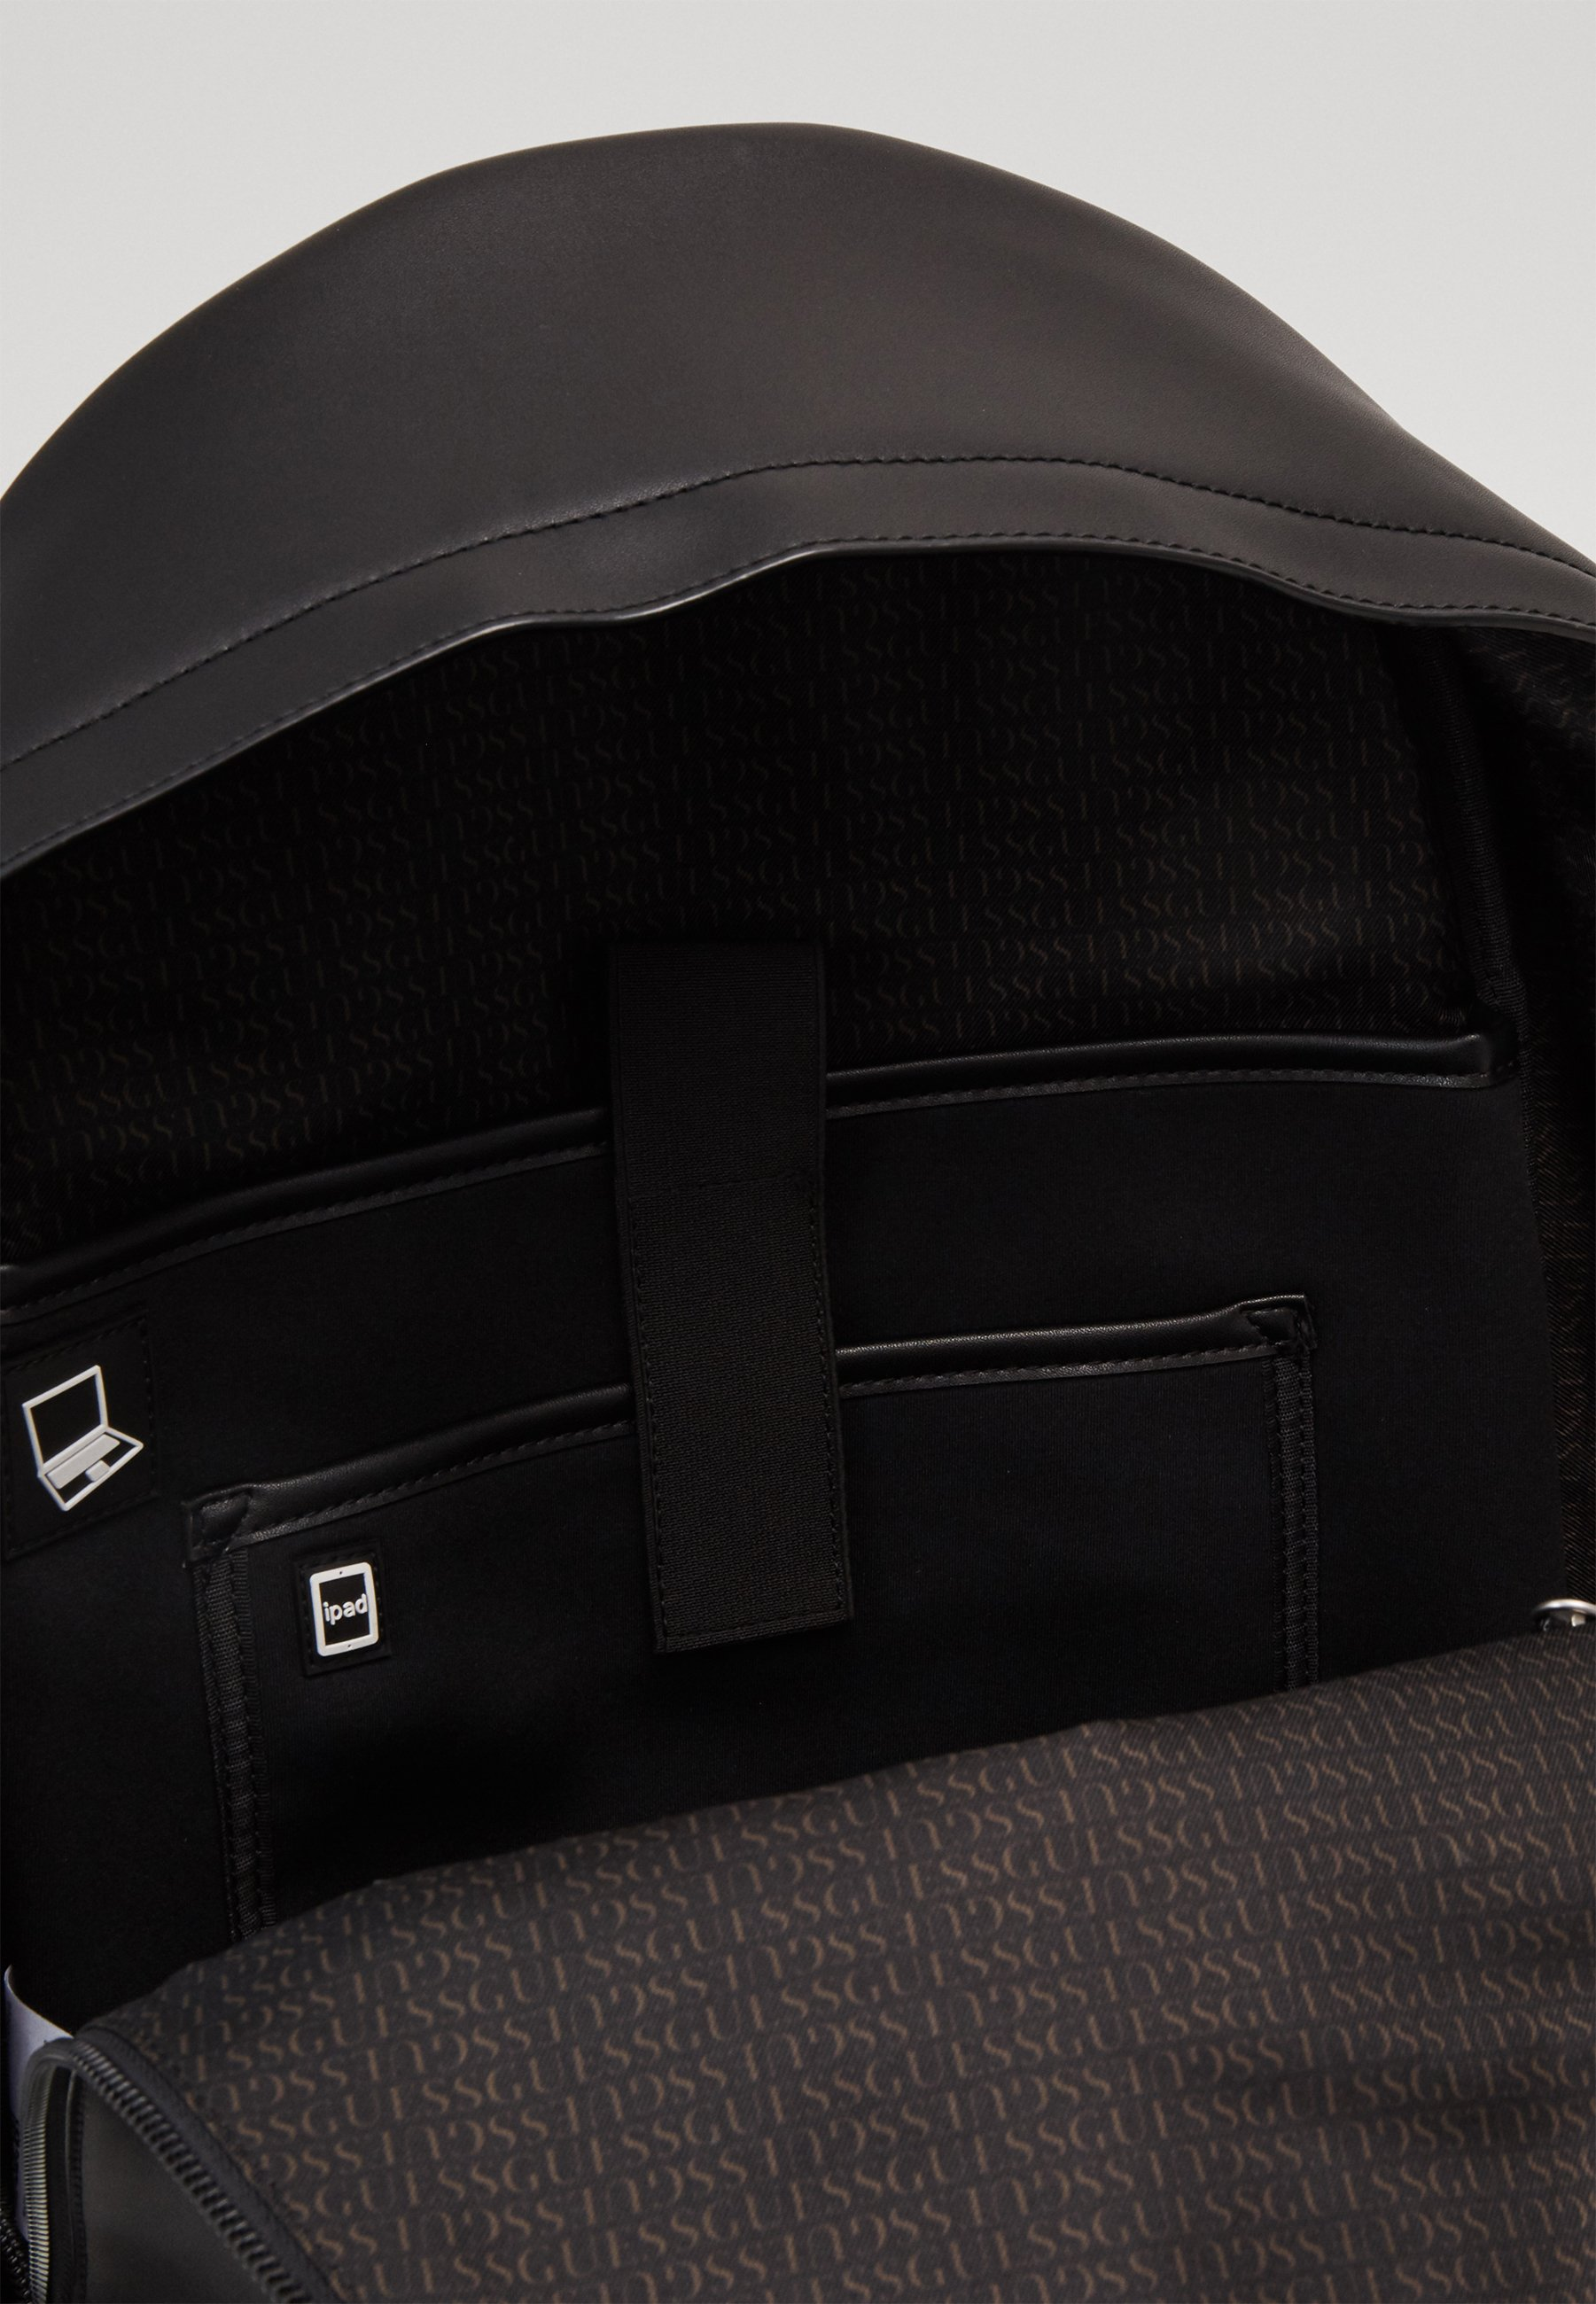 Guess DAN BACKPACK - Tagesrucksack - black/schwarz - Herrentaschen efgGB